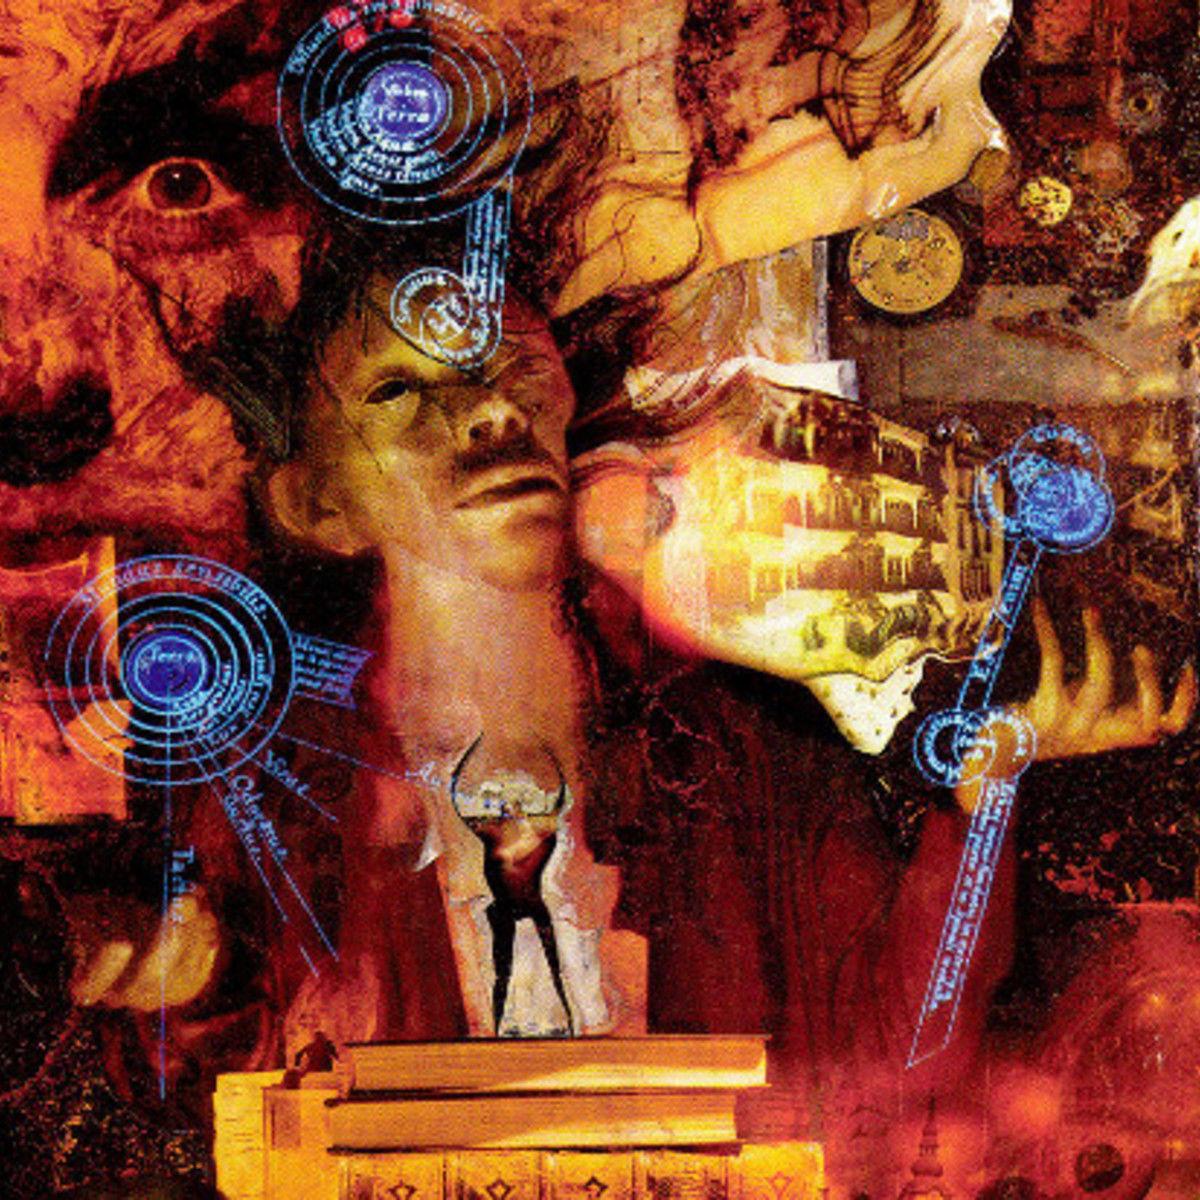 The Sandman Recensione - Nerdcore - Dave McKean